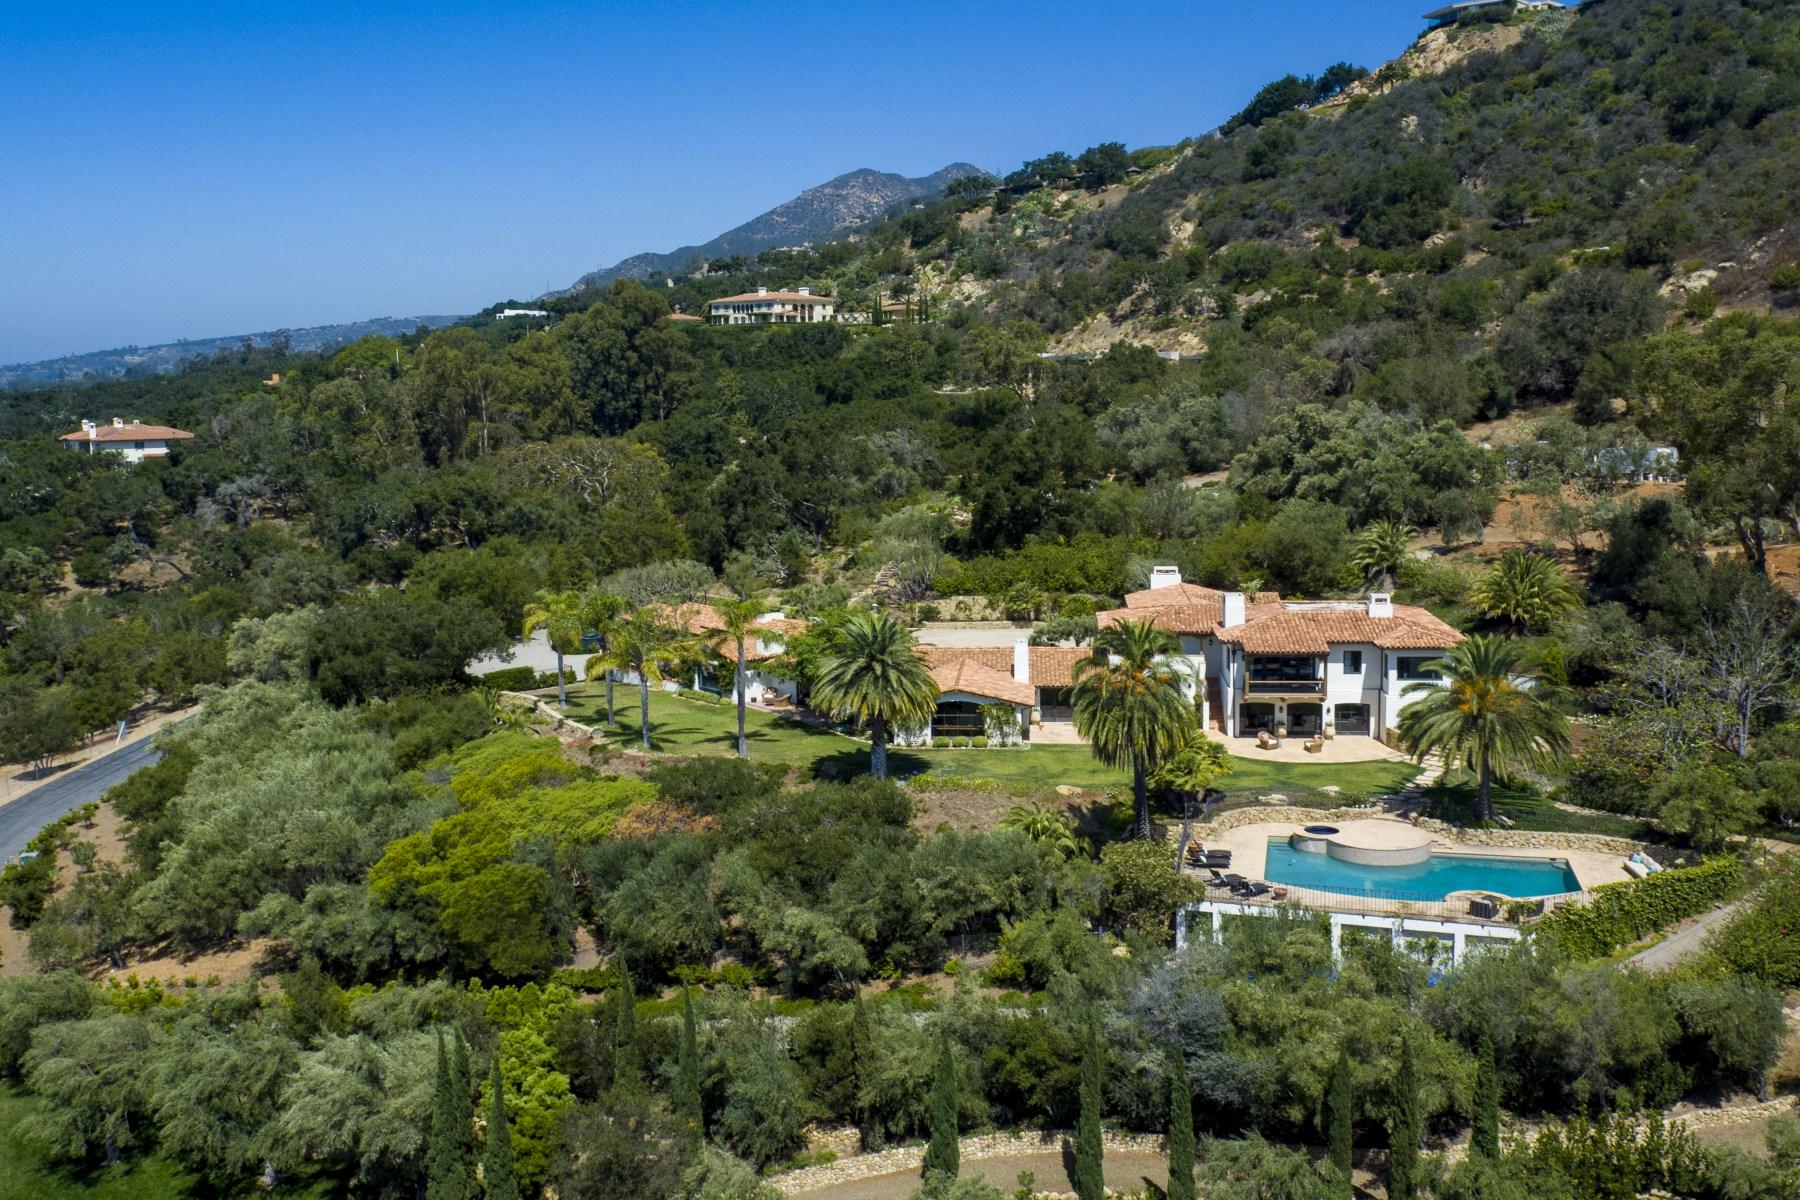 Nhà ở một gia đình vì Bán tại Historic Hacienda 1366 Oak Creek Canyon Road Montecito - Upper Village, Montecito, California, 93108 Hoa Kỳ